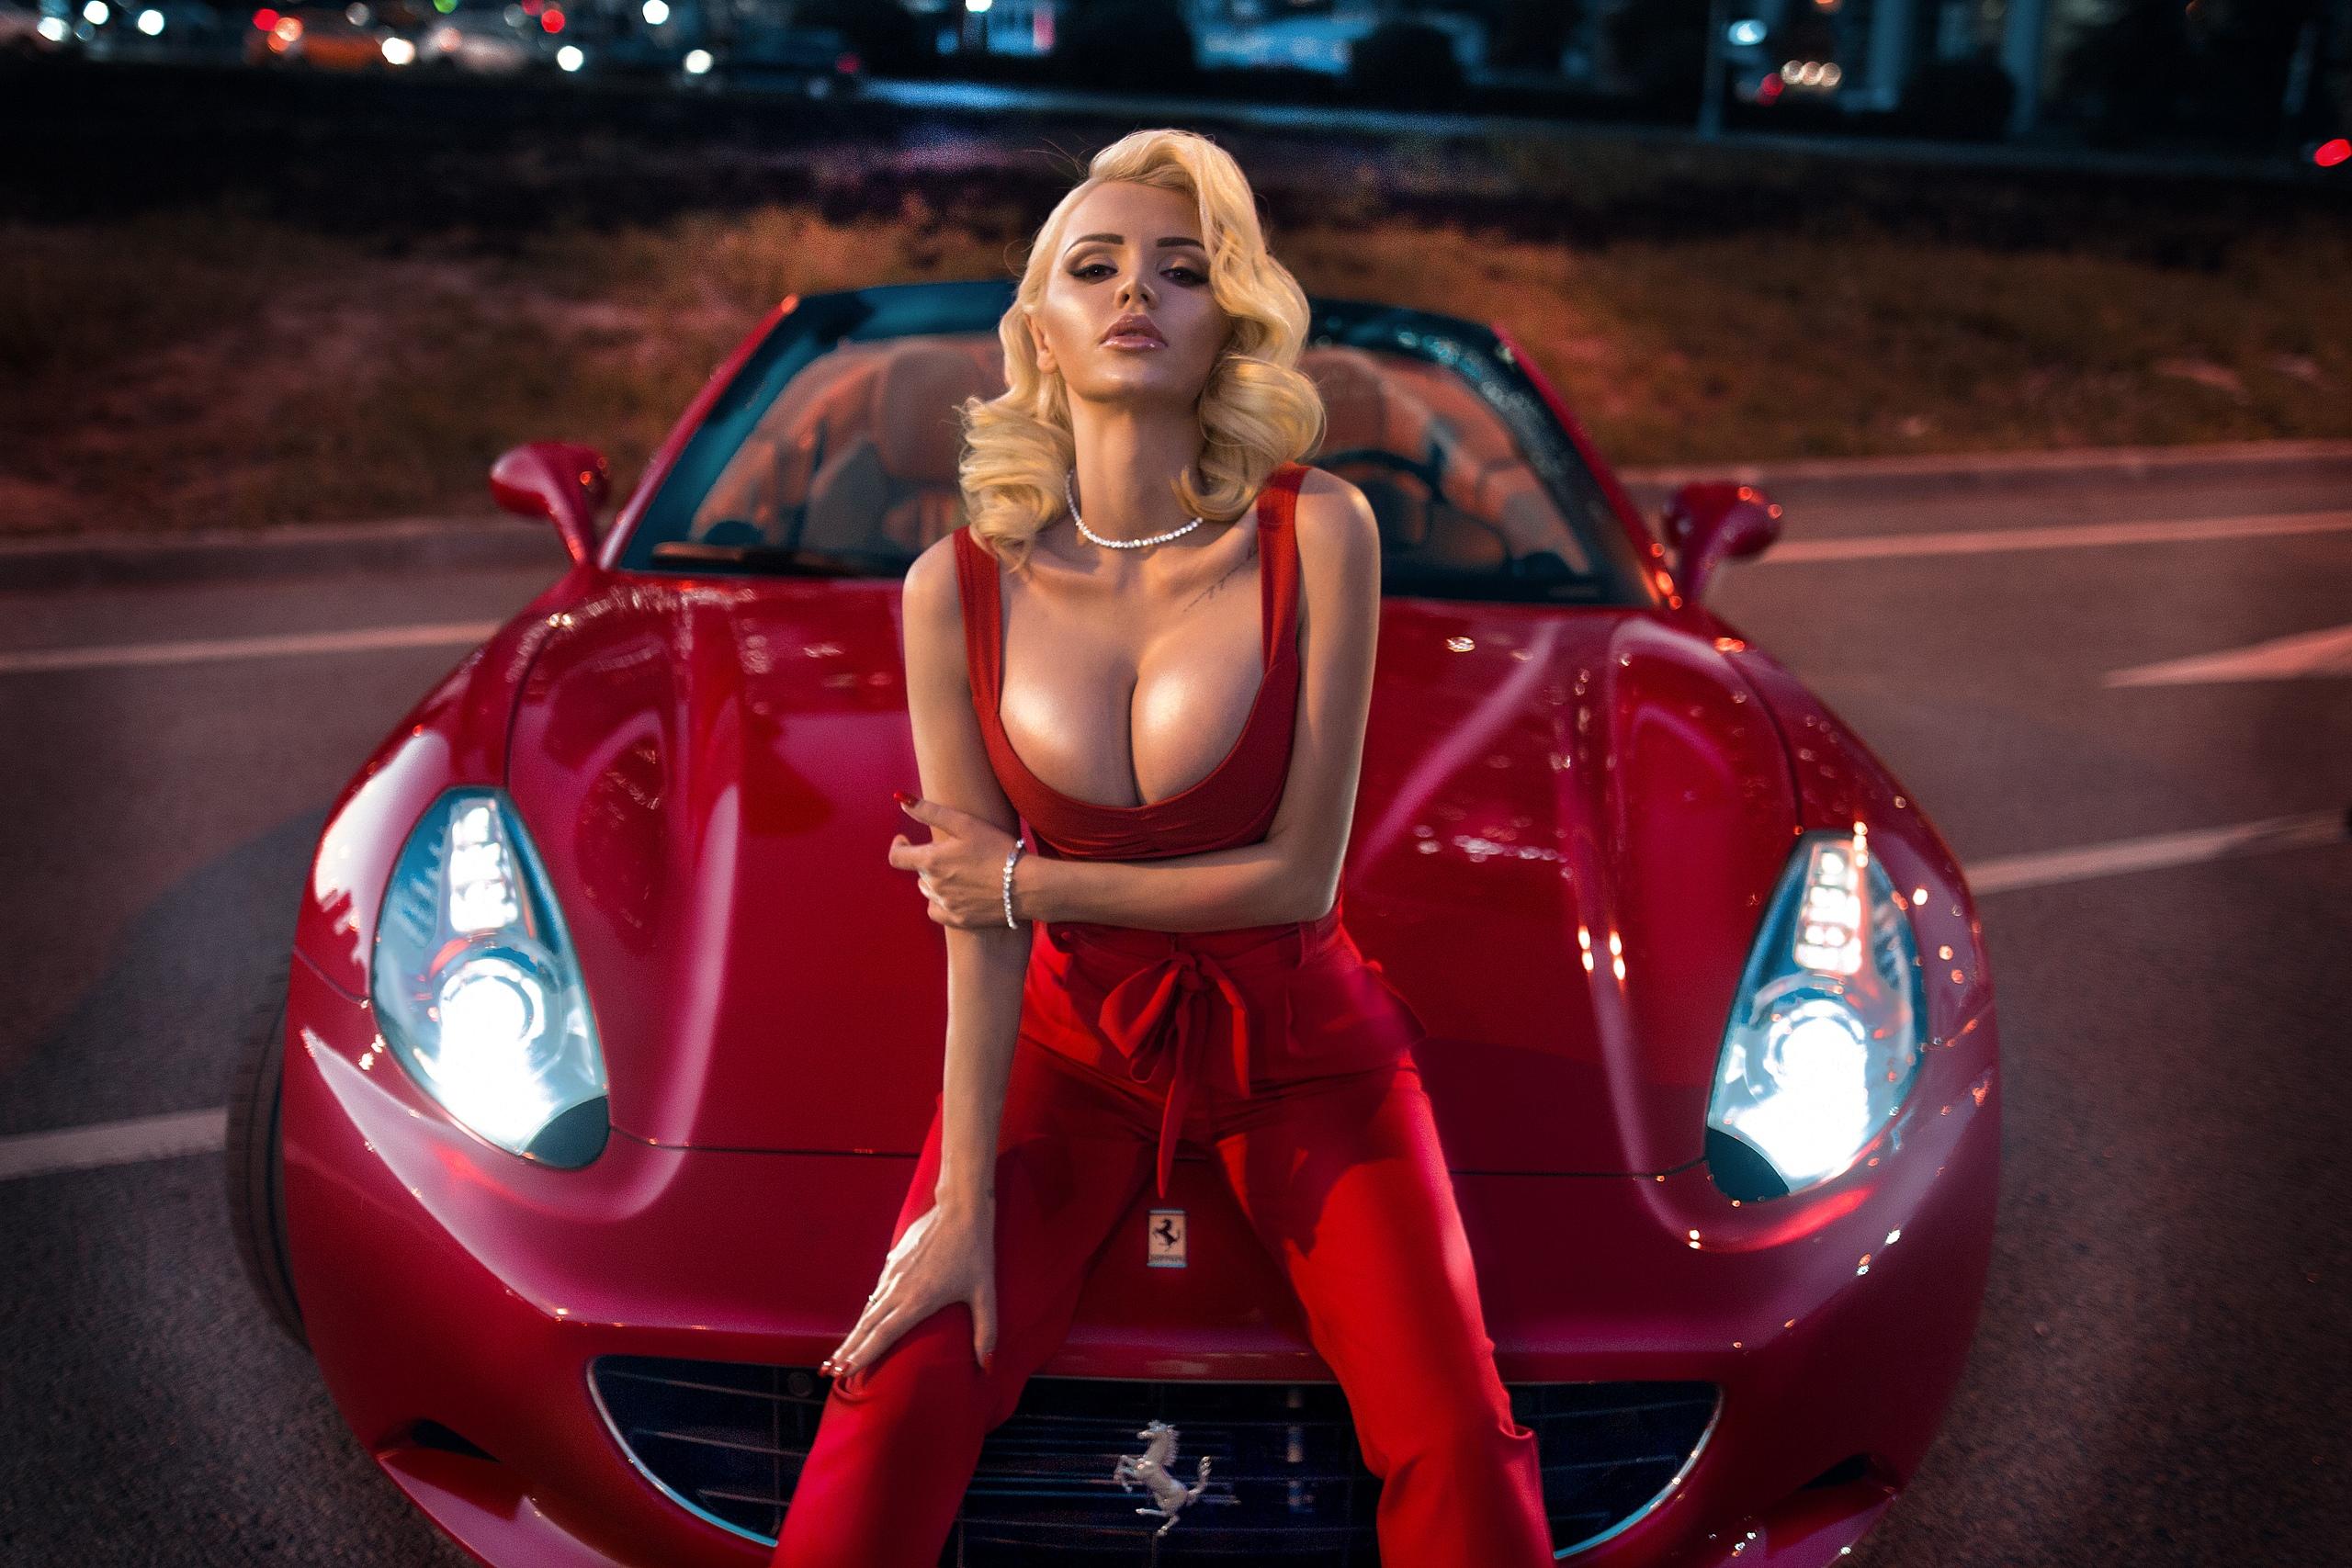 Max Sokolovich women model women with cars car Ferrari outdoors depth of  field blonde looking at a57bd03819